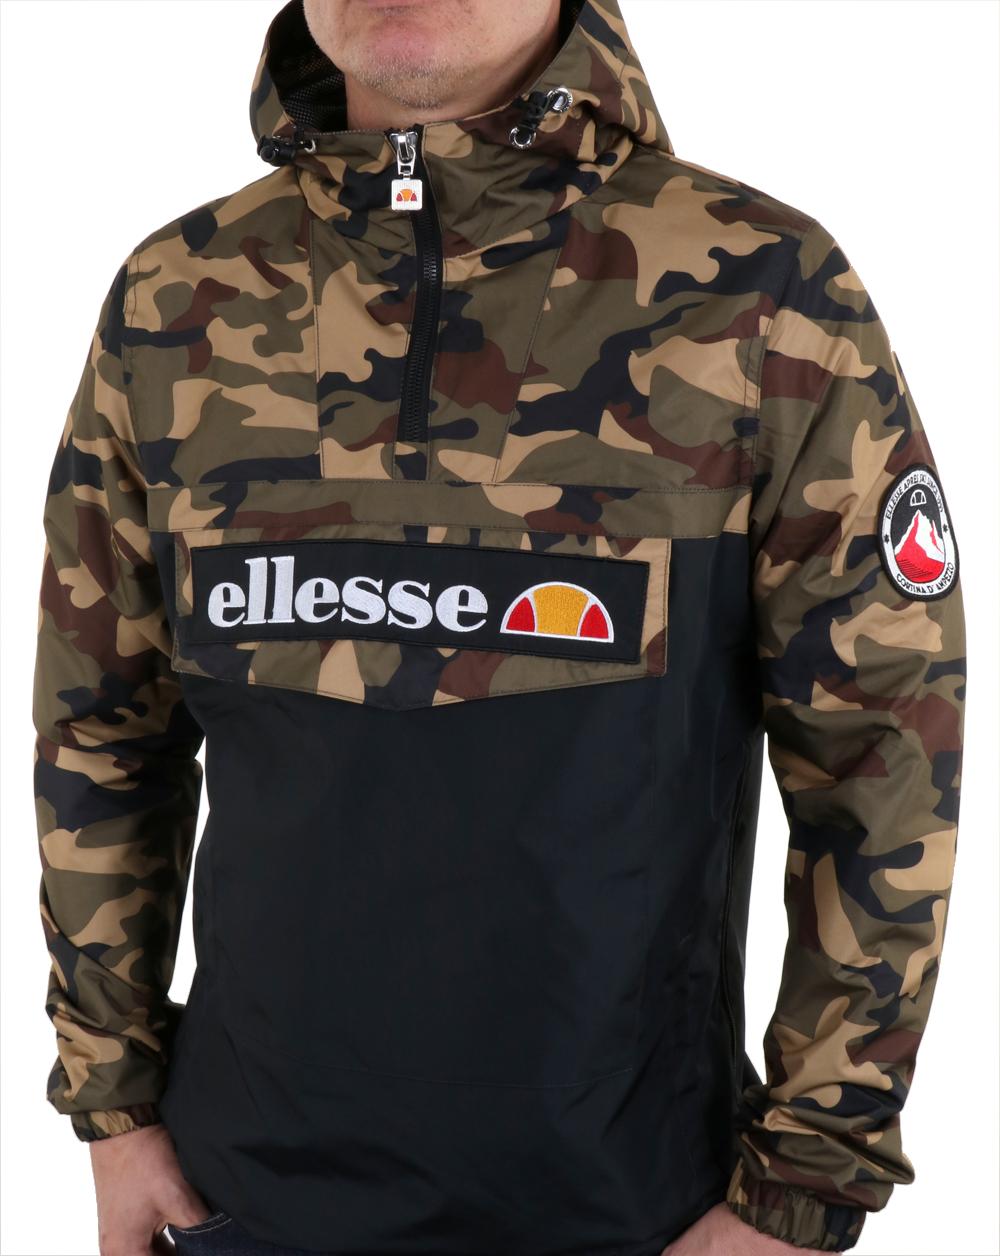 fc3d50e8e5 Ellesse Quarter Zip Overhead Jacket Camo